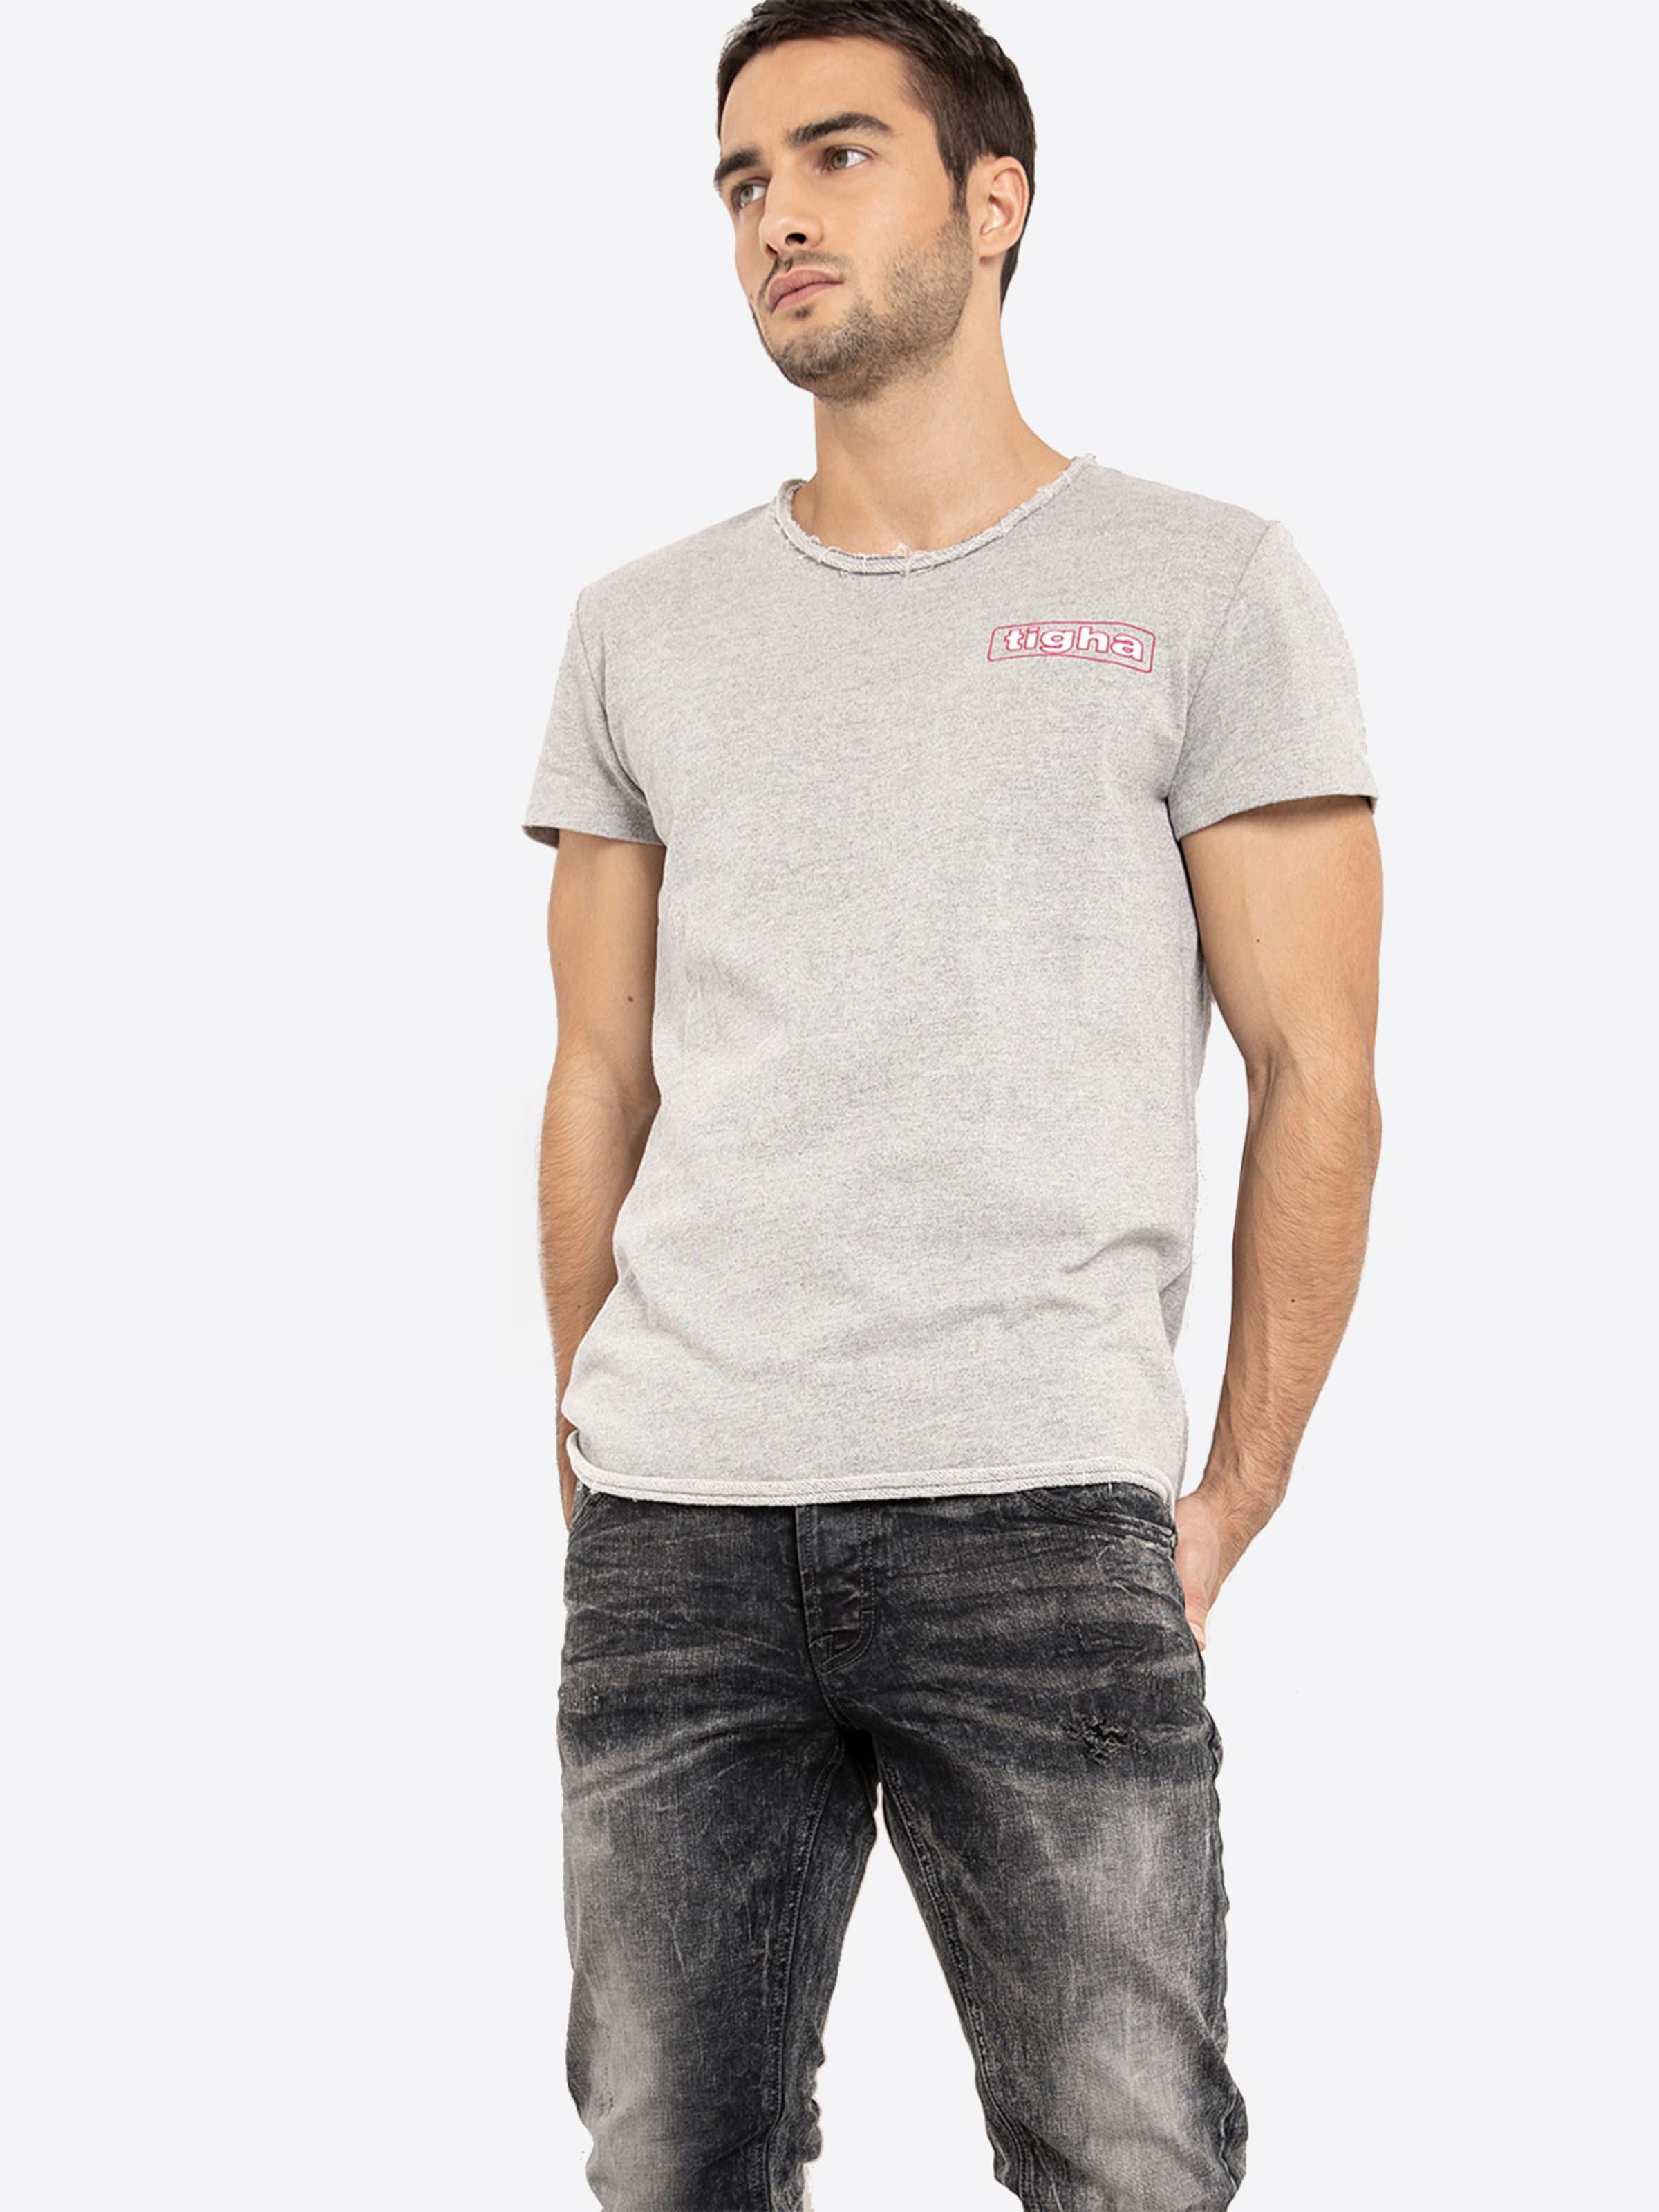 GraumeliertDunkelrot Shirt Tigha Shirt 'meo' GraumeliertDunkelrot Shirt 'meo' Tigha Tigha In 'meo' In 35LSAR4qcj